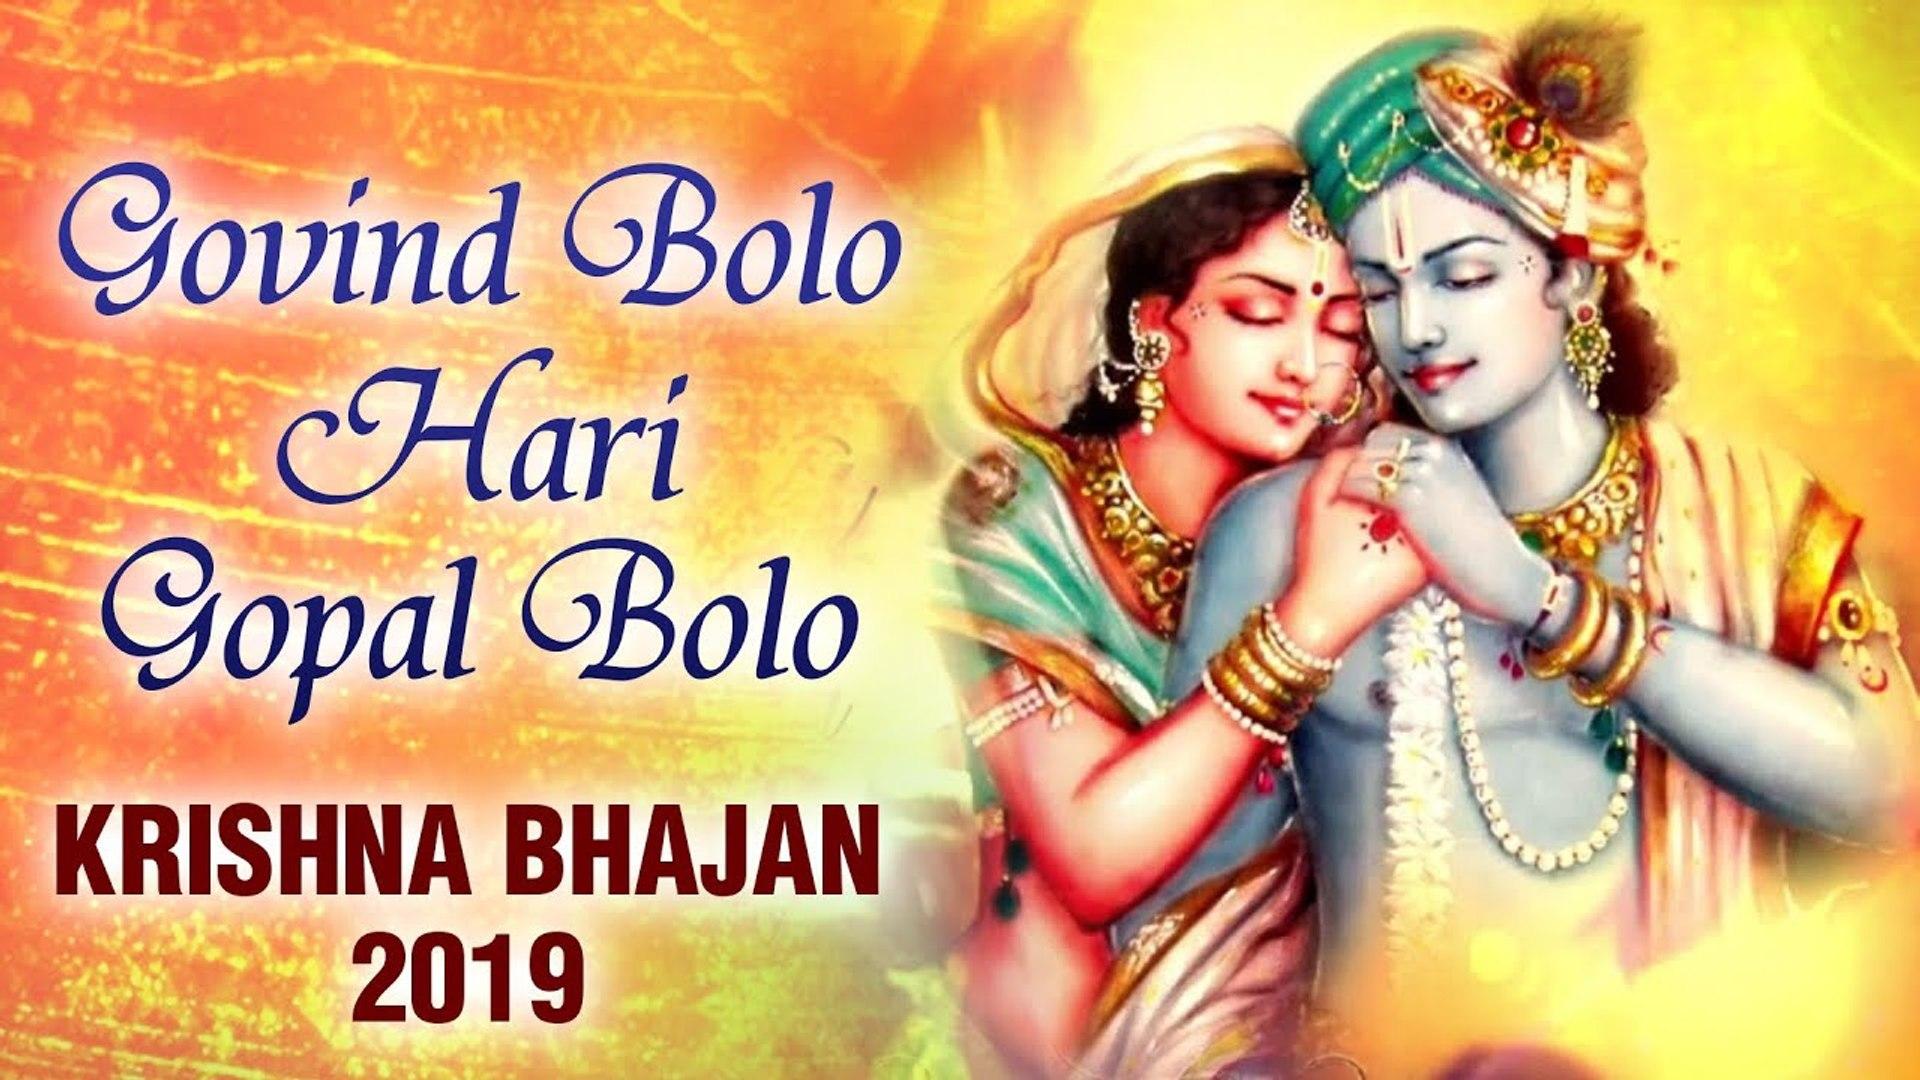 Govind Bolo Hari Gopal Bolo | Popular krishna Bhajan 2019 | गोविंद बोलो हरि गोपाल बोलो